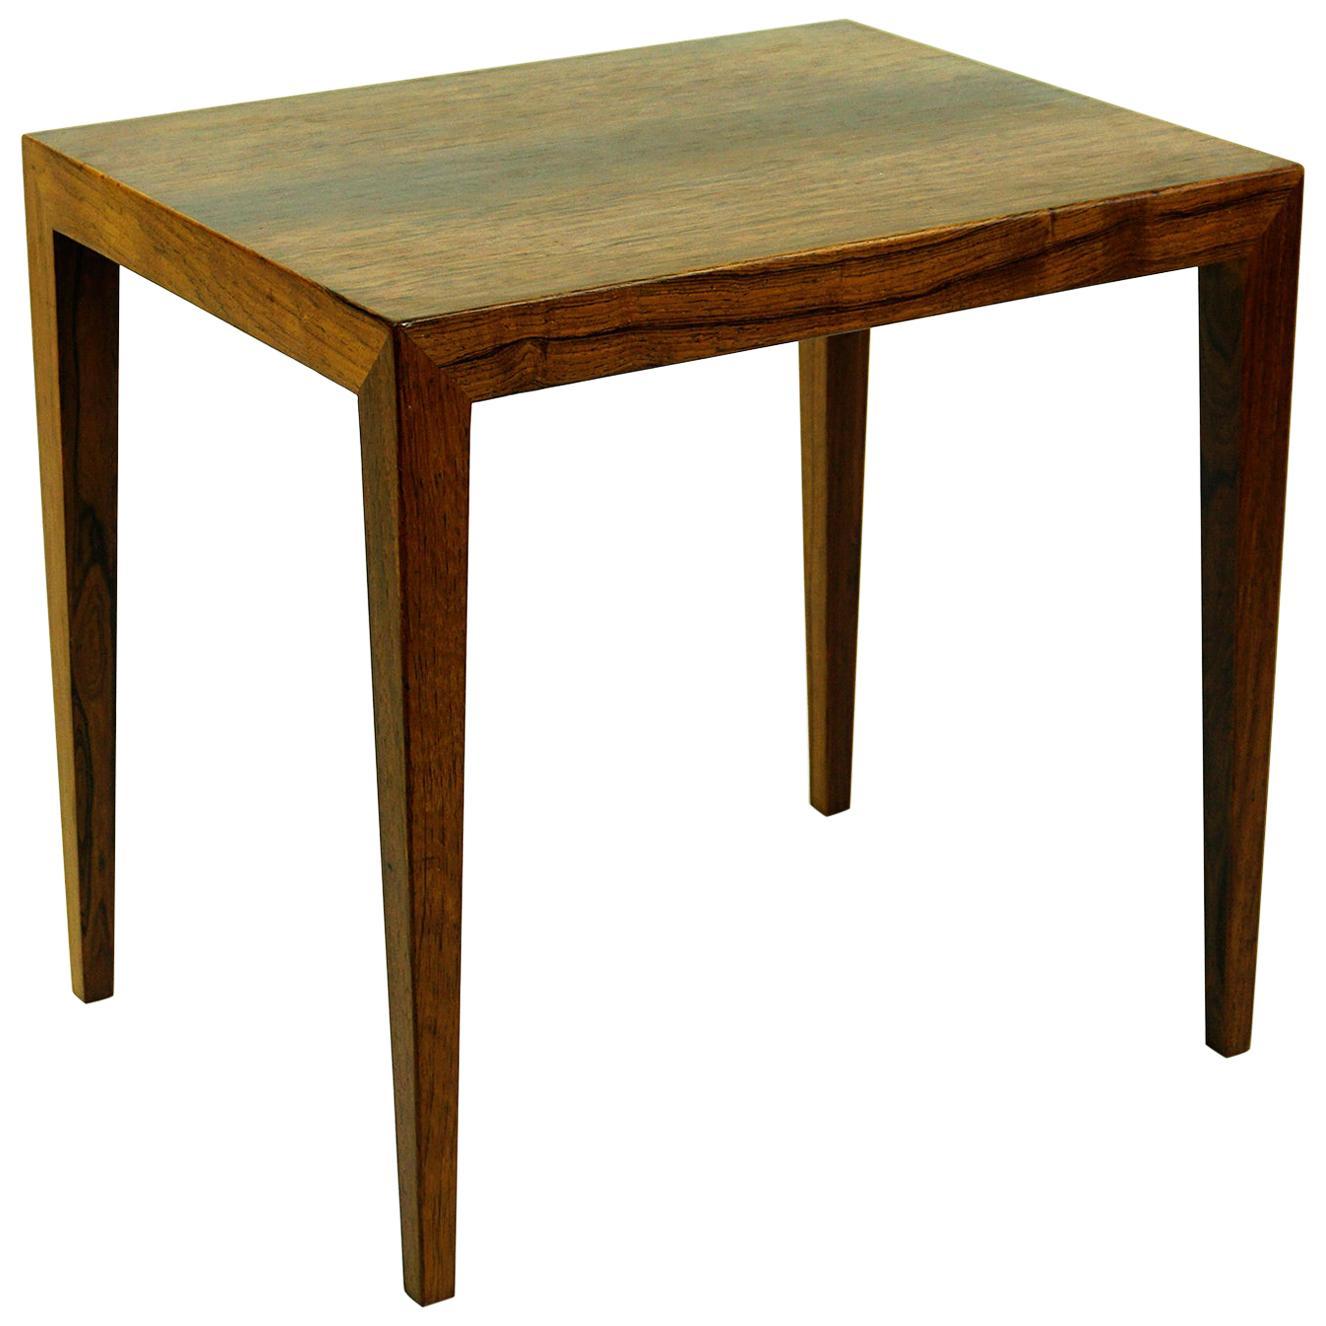 Scandinavian Modern Rosewood Side Table by Severin Hansen for Haslev